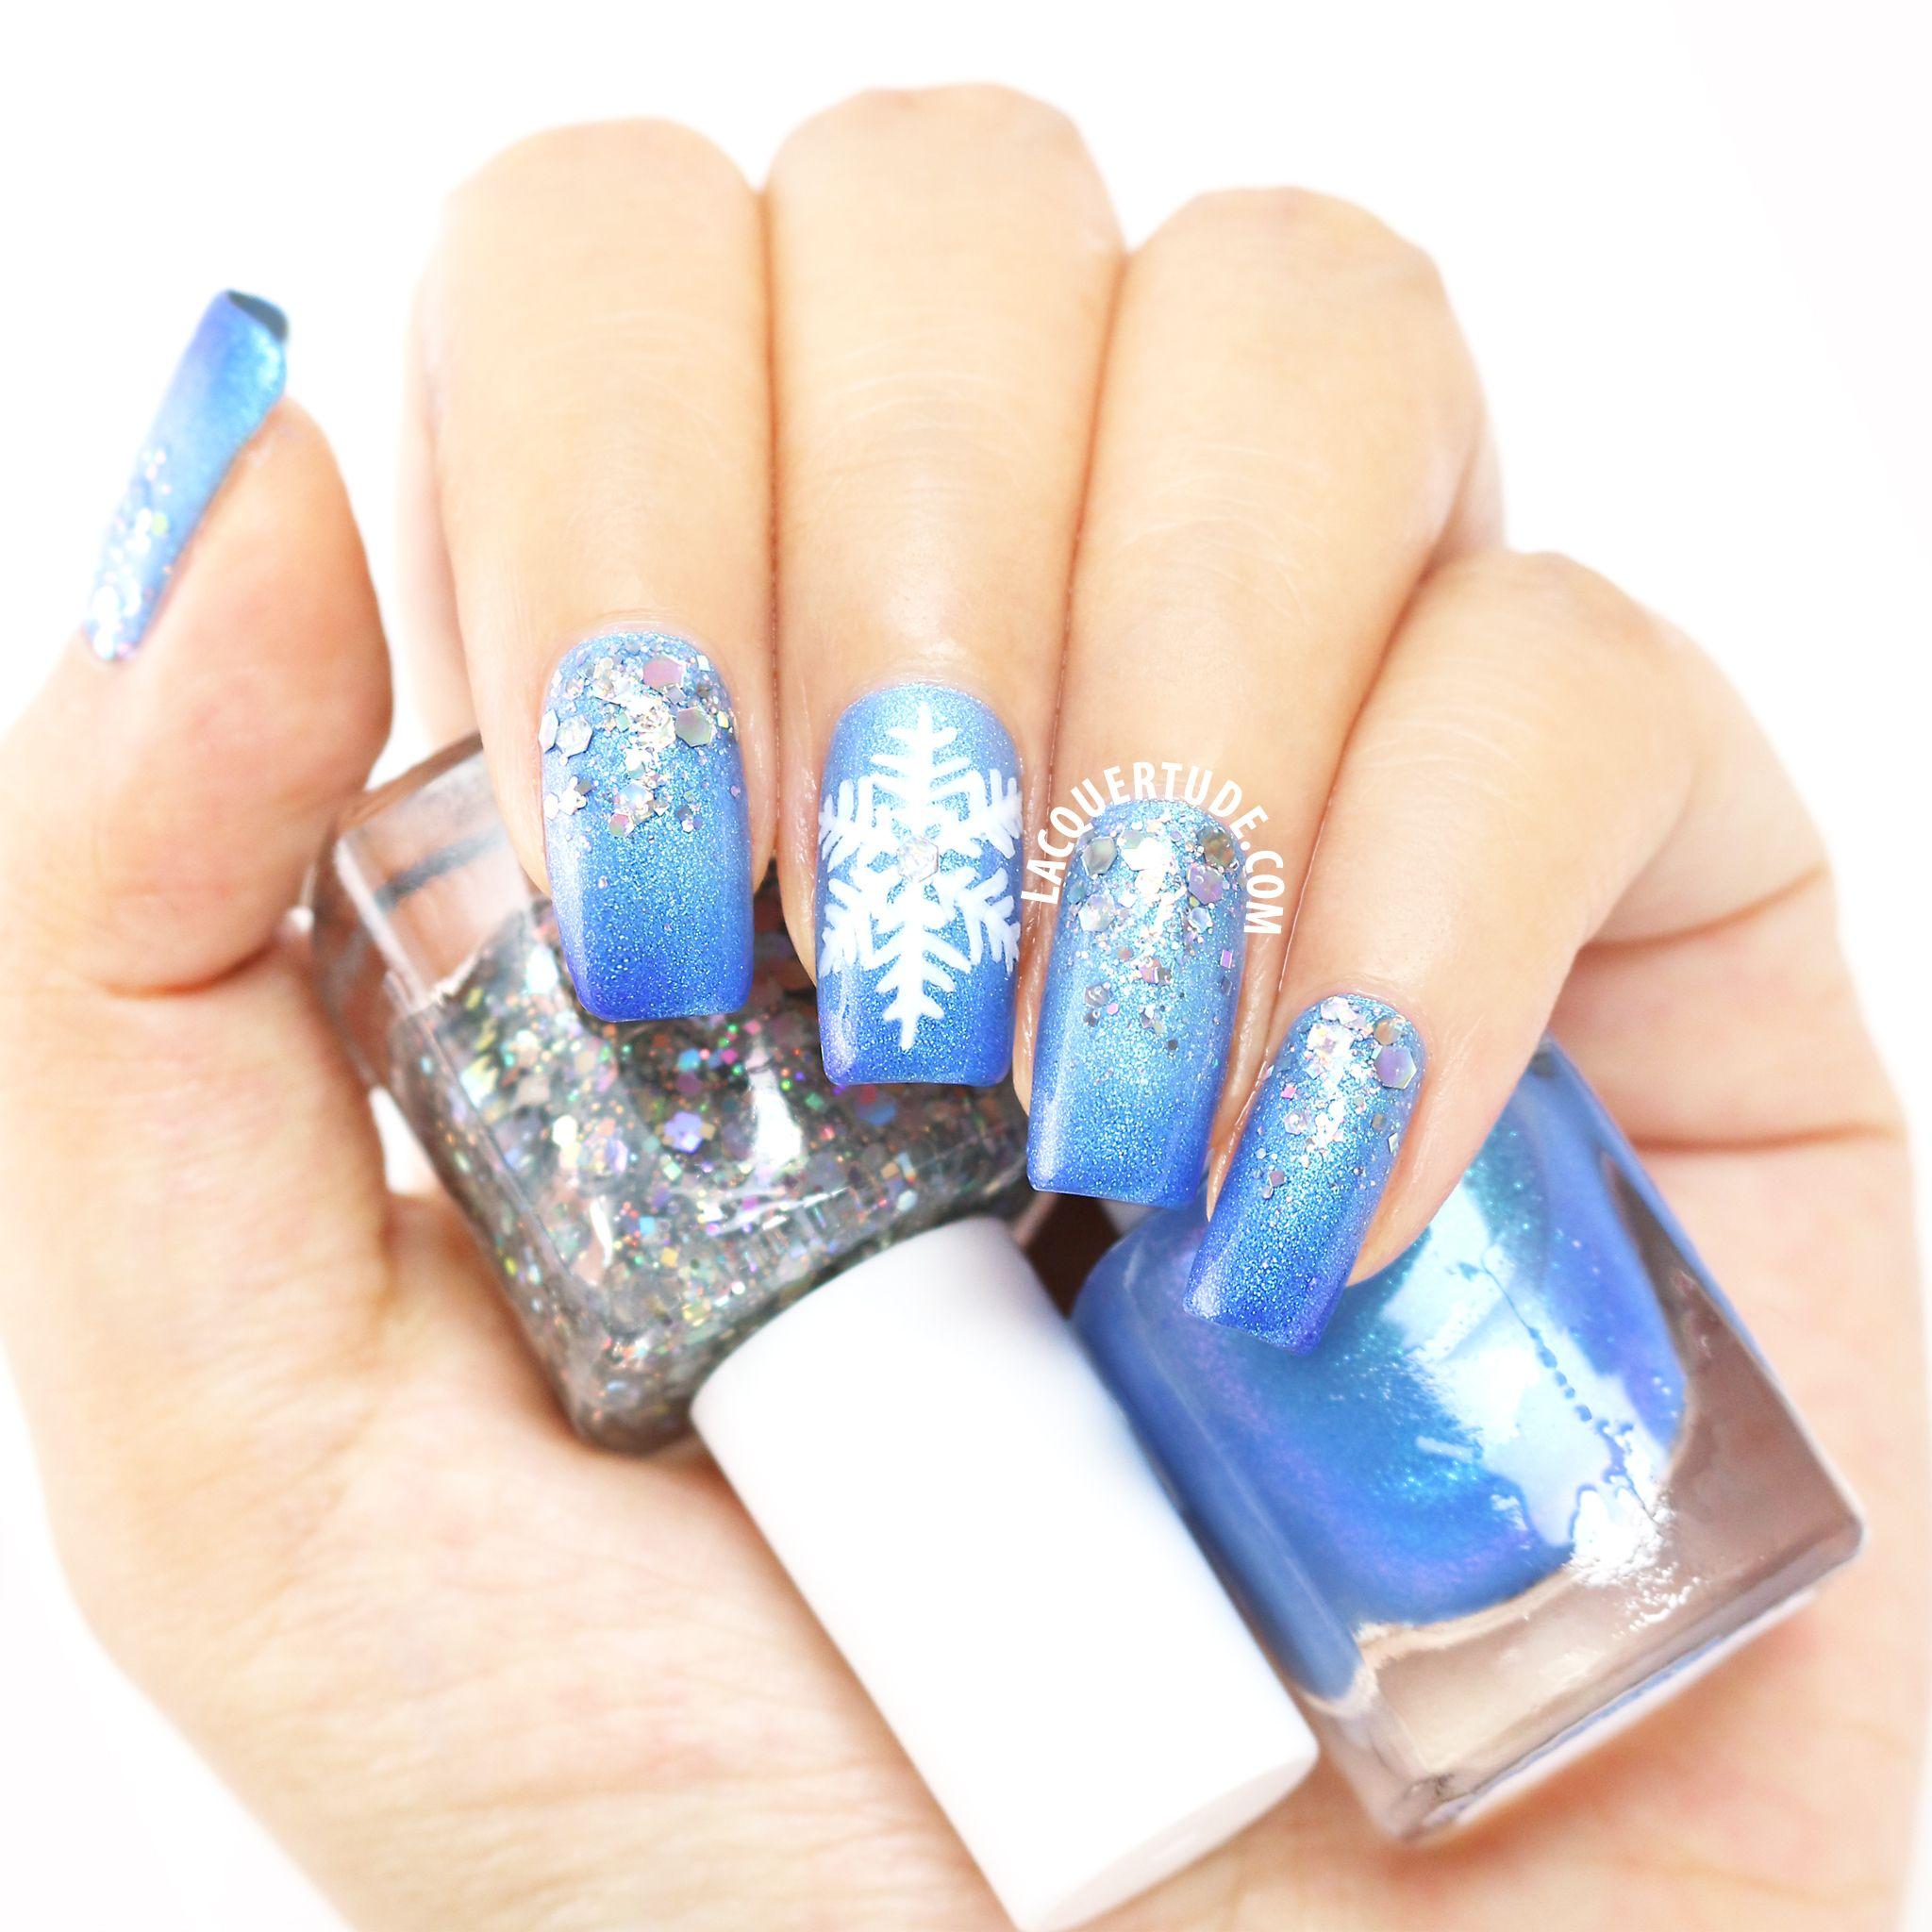 Lacquertudefun Winterwonderland Nail Art At Your Fingertips